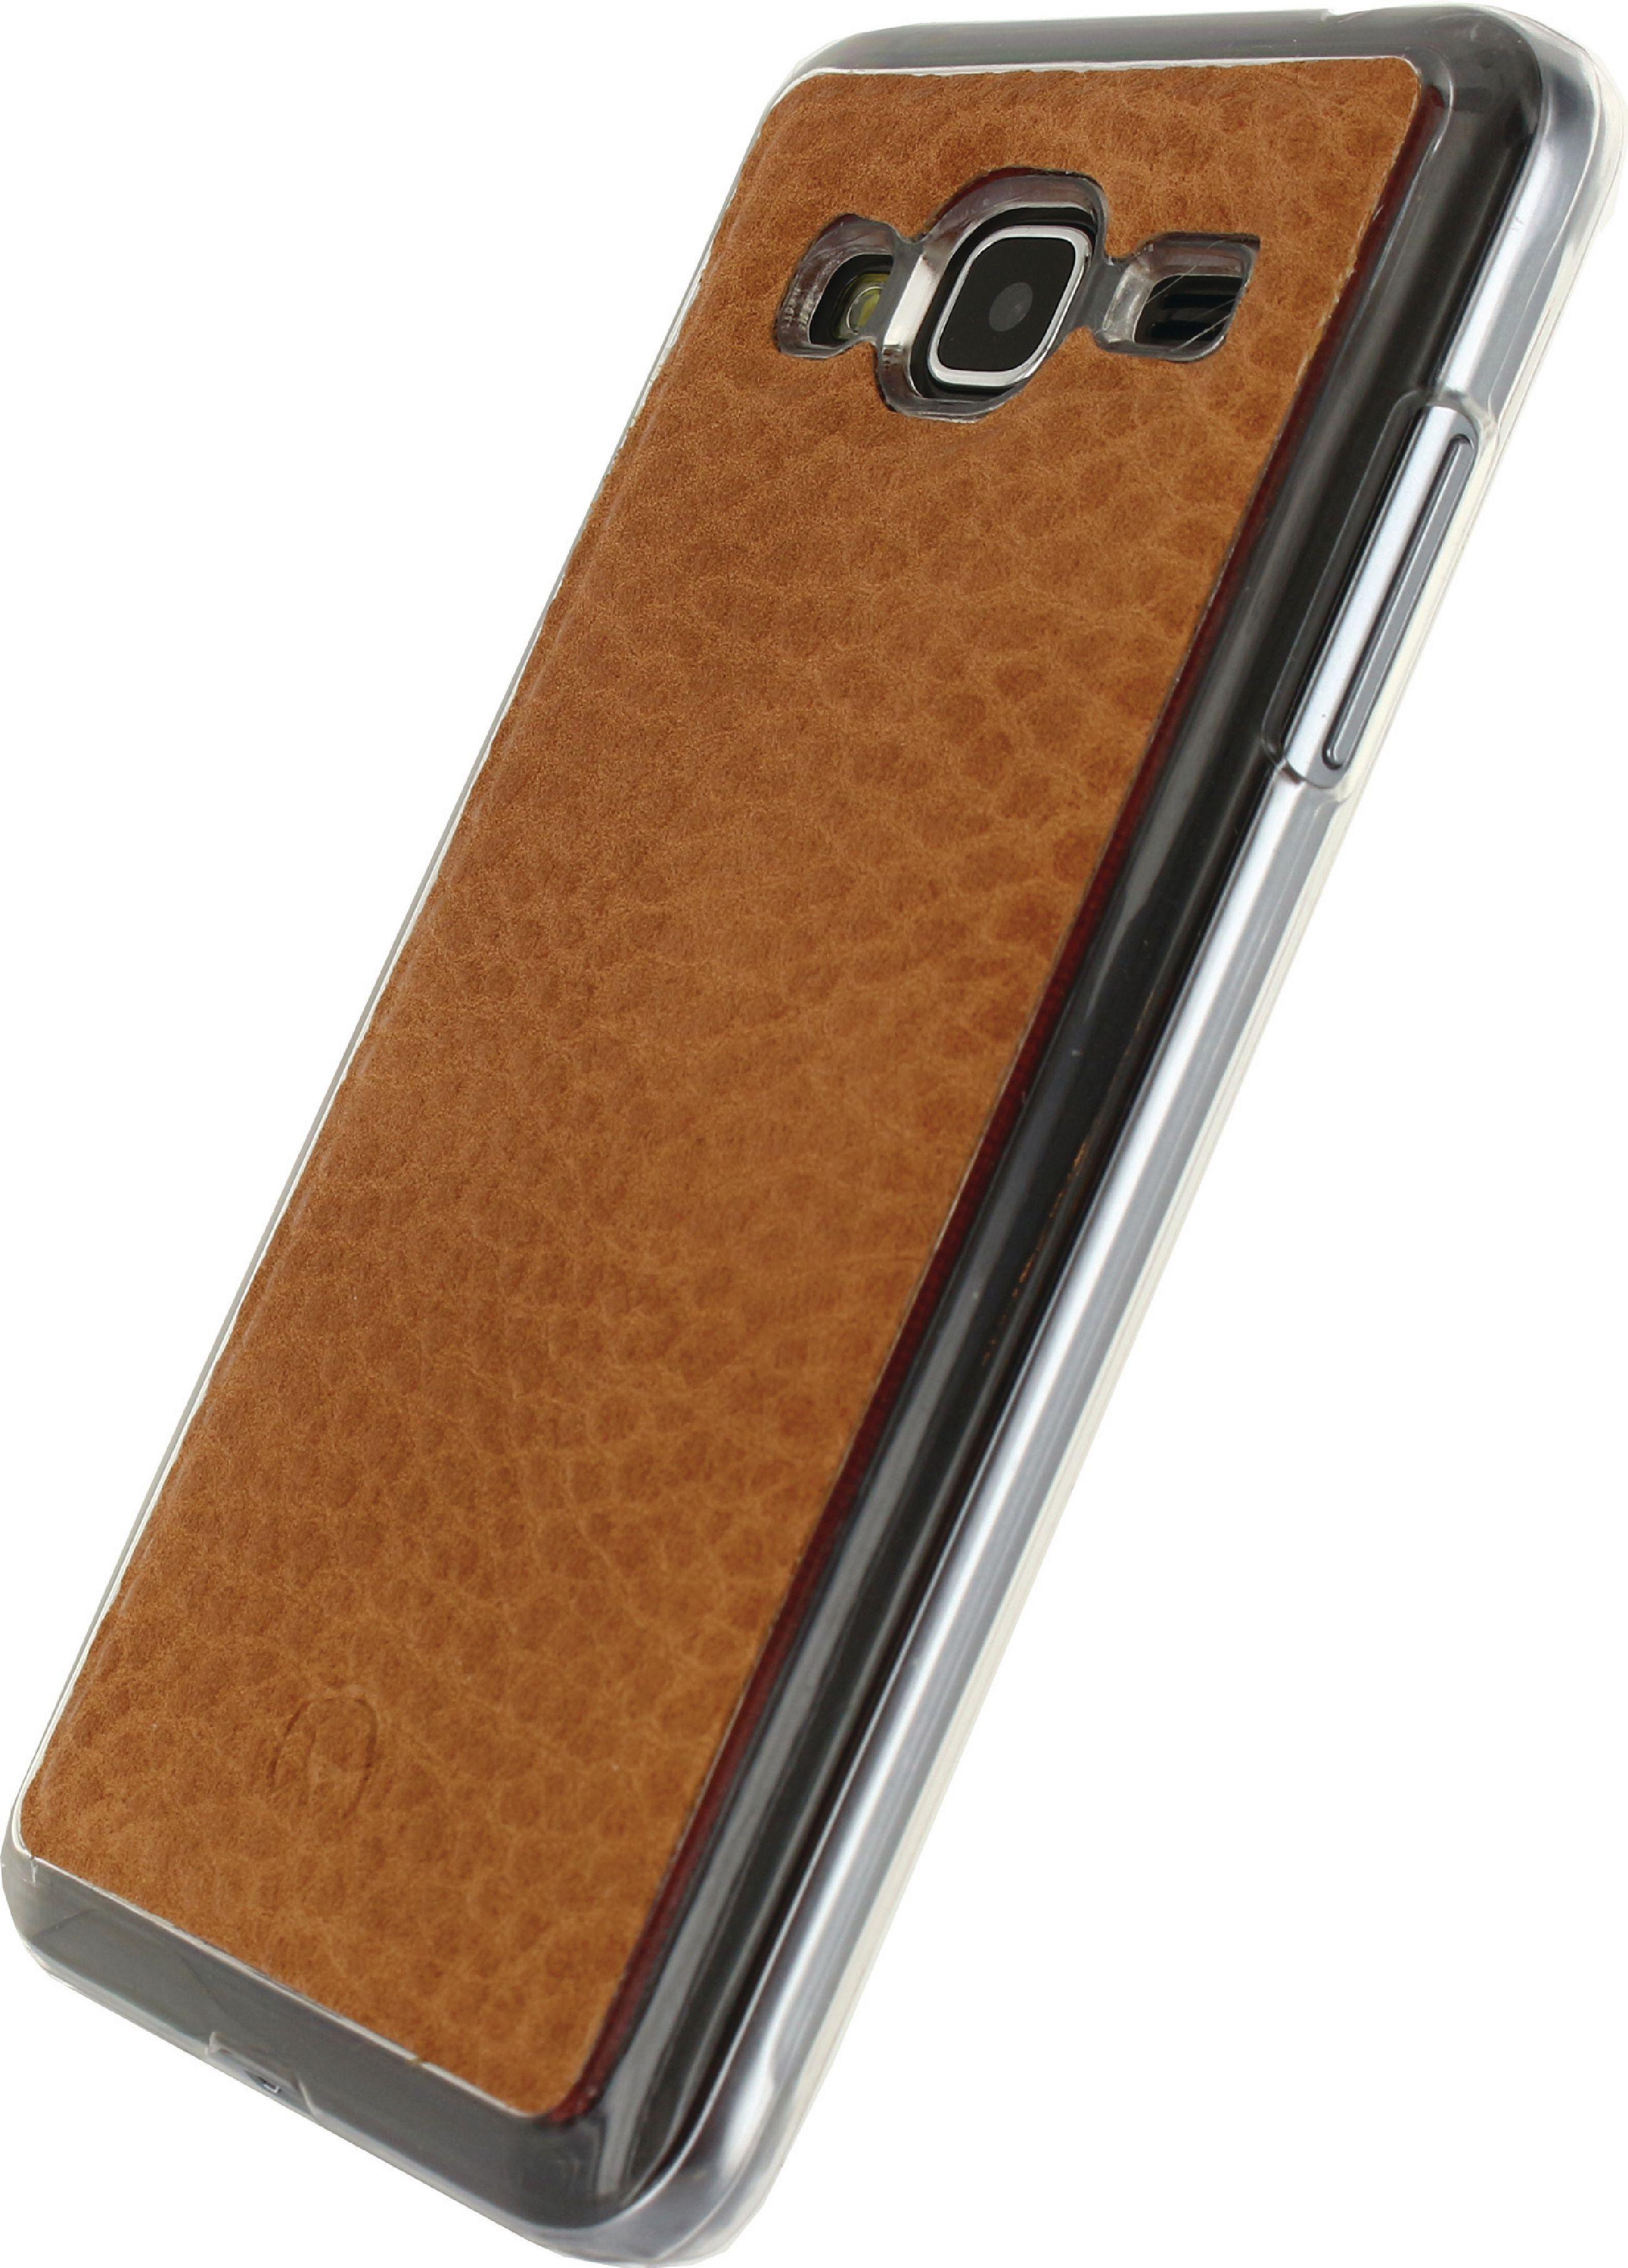 Image of   Telefon Aftageligt Lommebogsetui Samsung Galaxy J3 2016 Brun